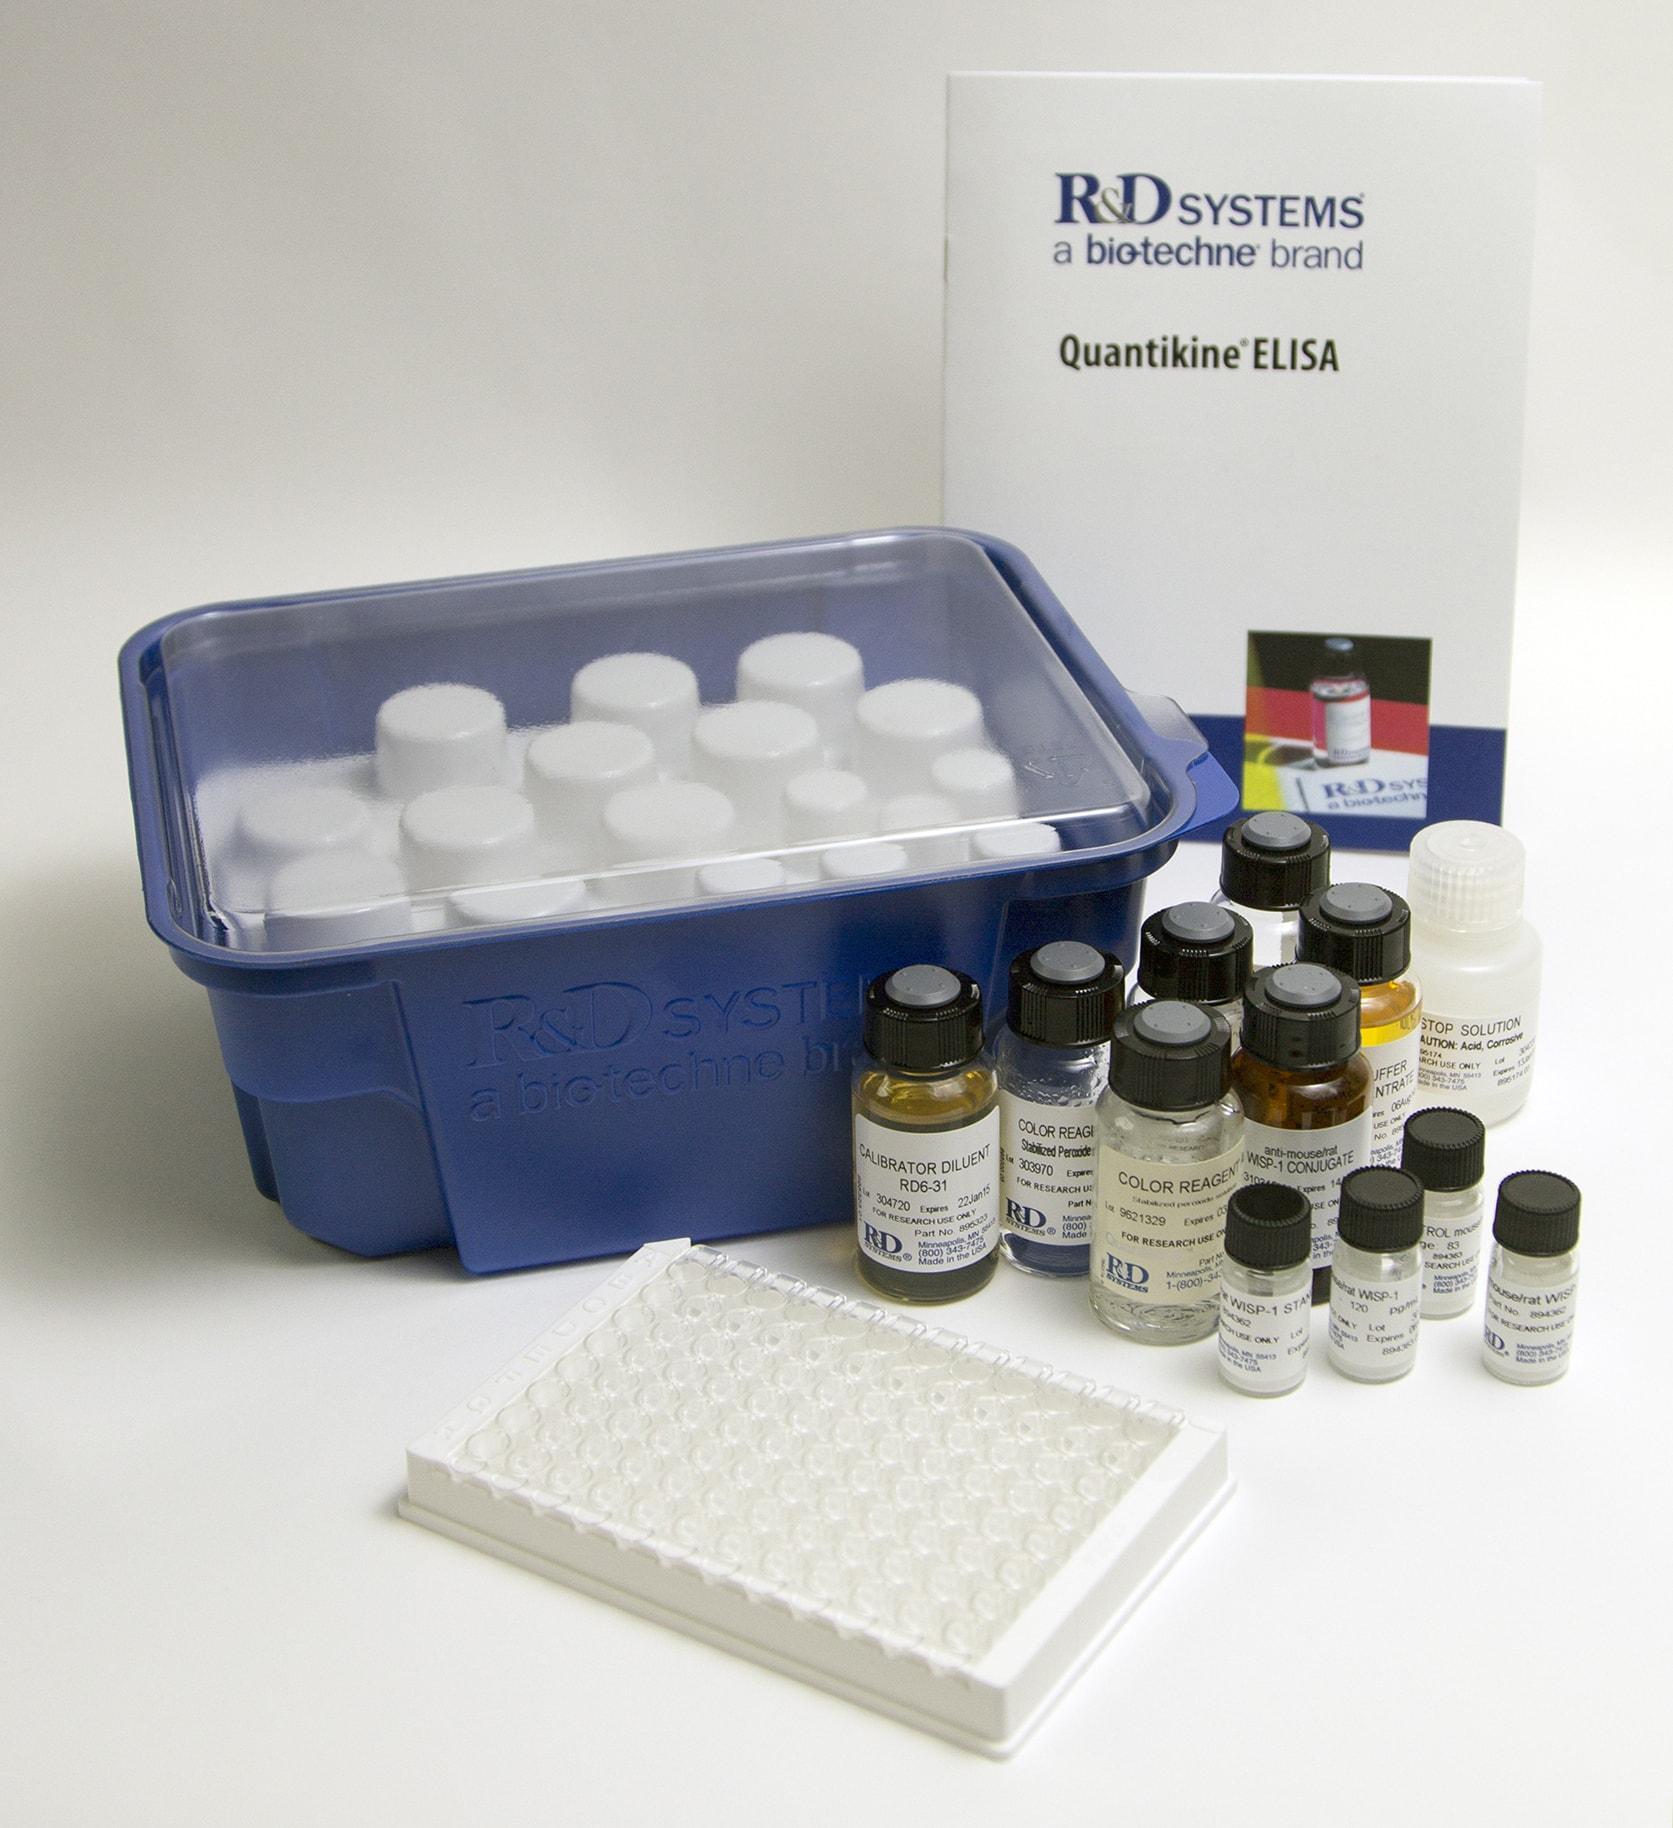 R&D Systems: Human CXCL12/SDF-1 alpha Quantikine ELISA Kit